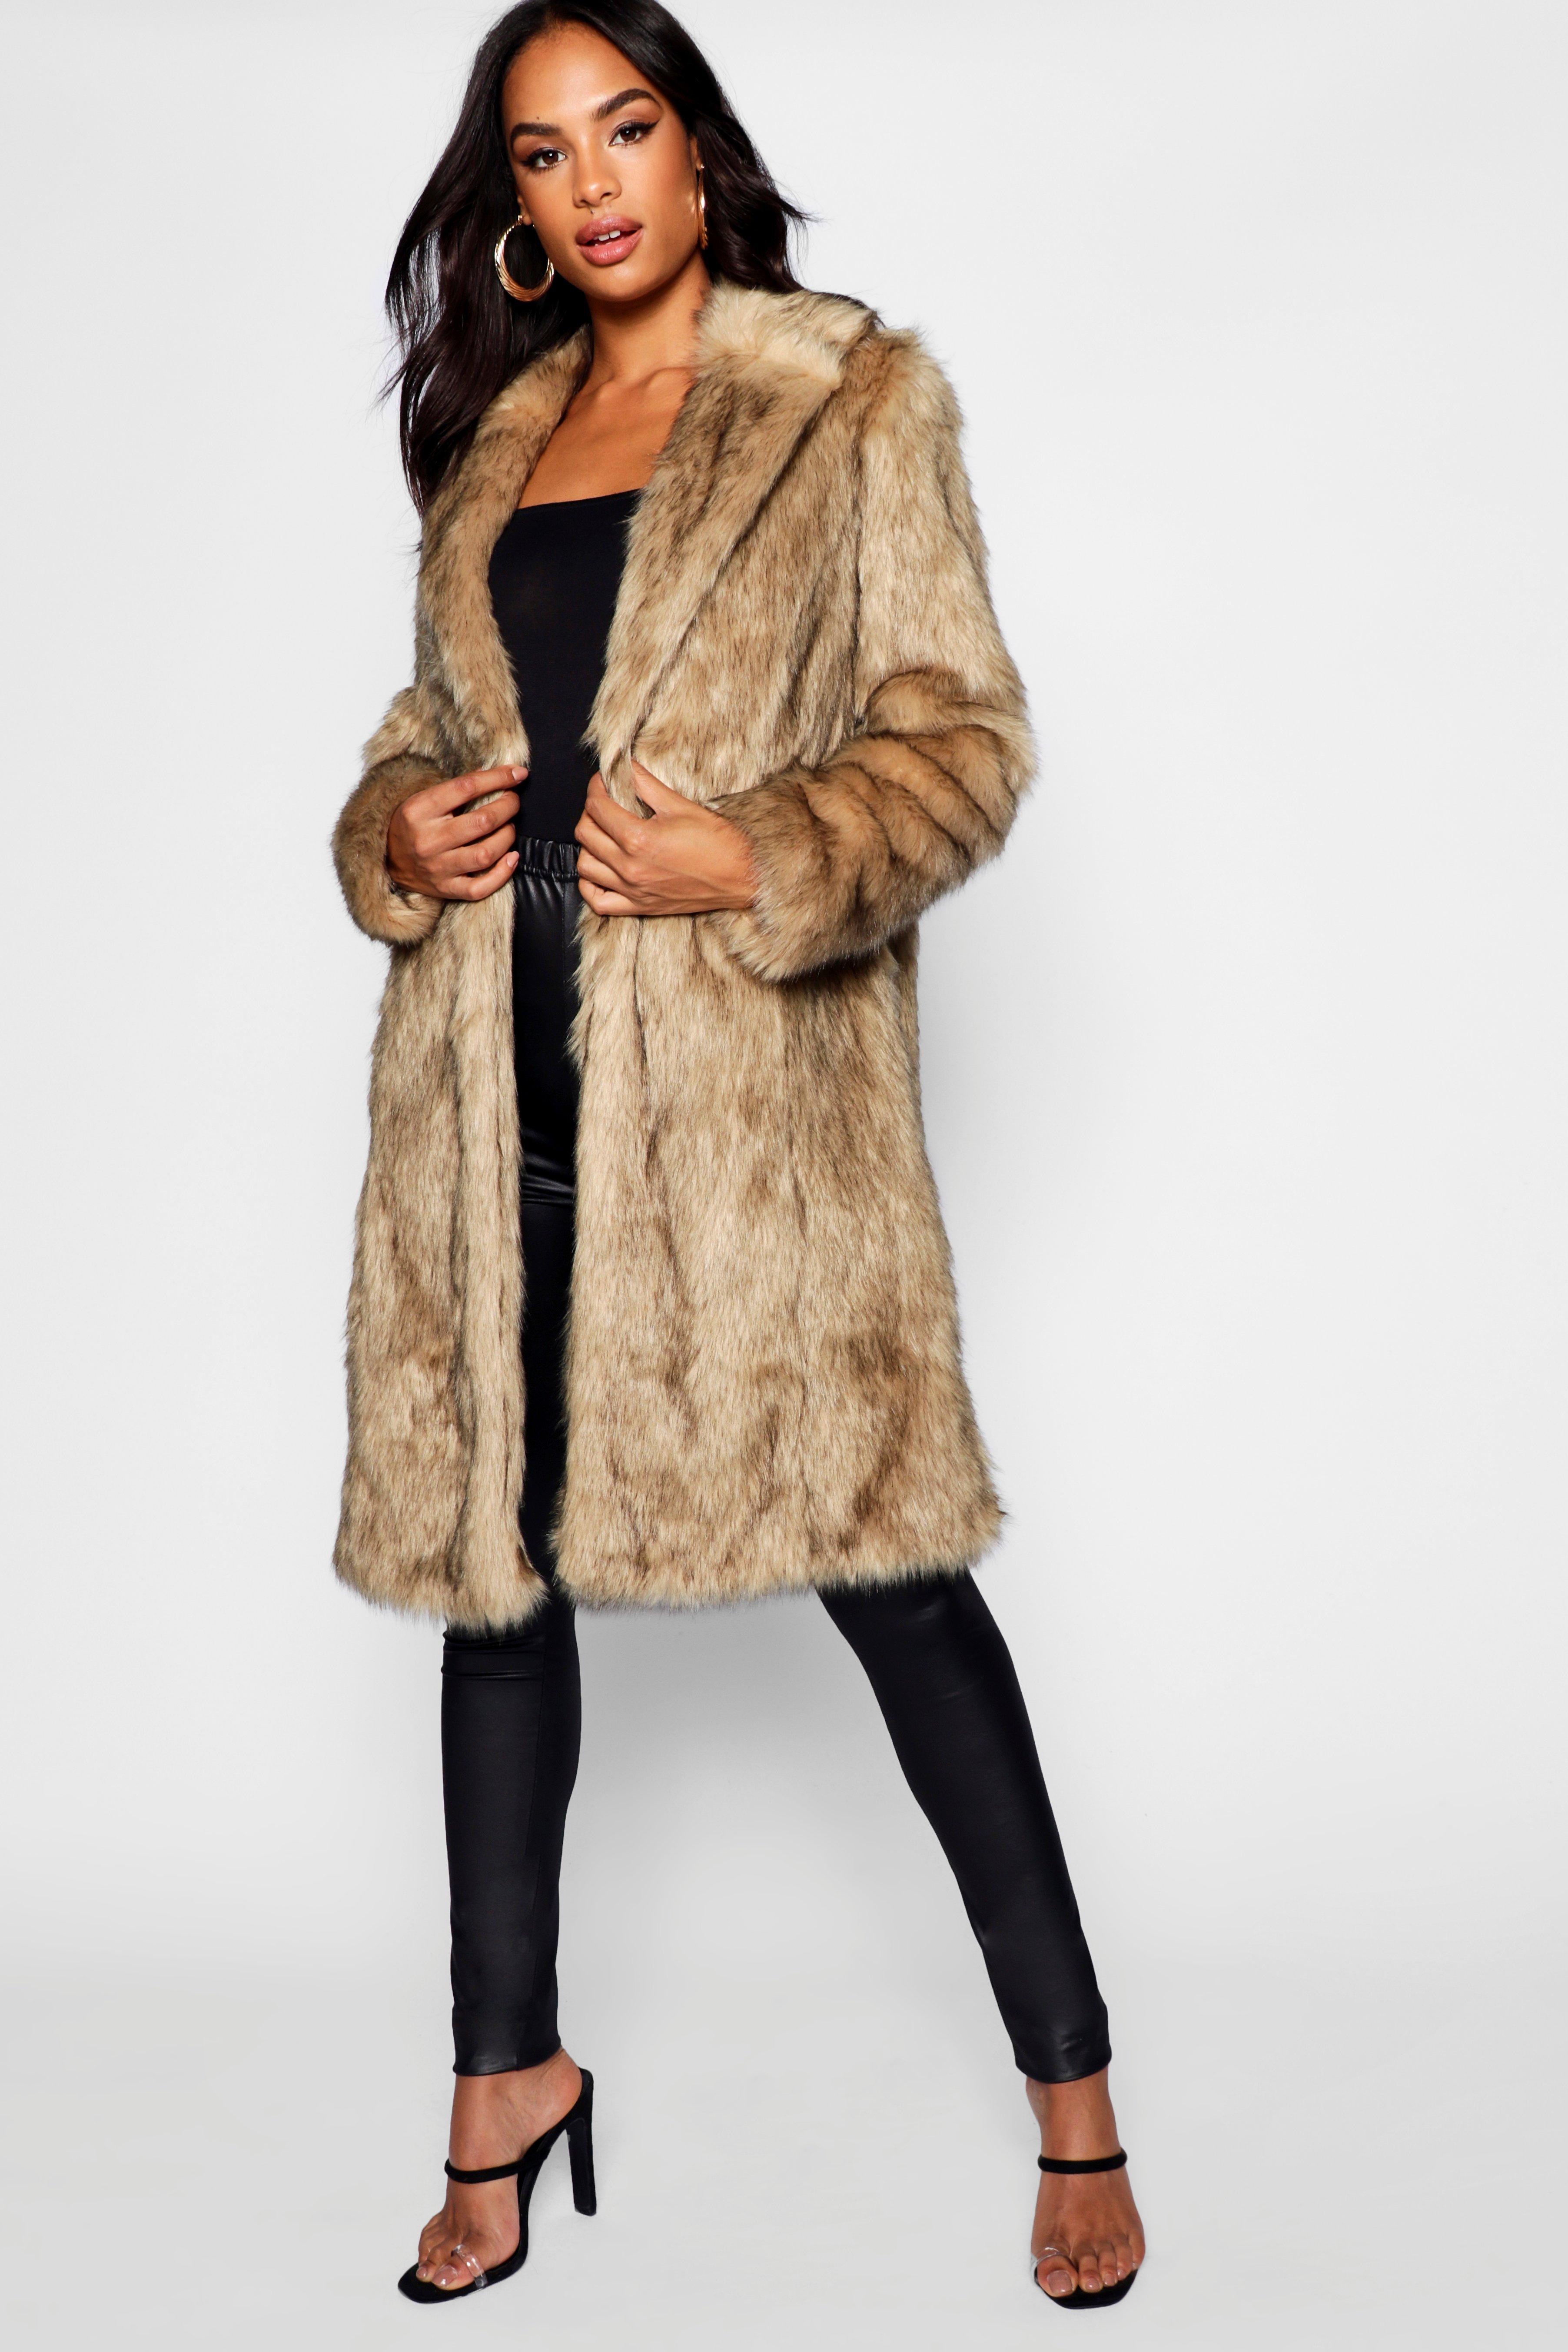 70s Jackets, Furs, Vests, Ponchos Womens Tall Faux Fur Coat - Beige - 14 $110.00 AT vintagedancer.com